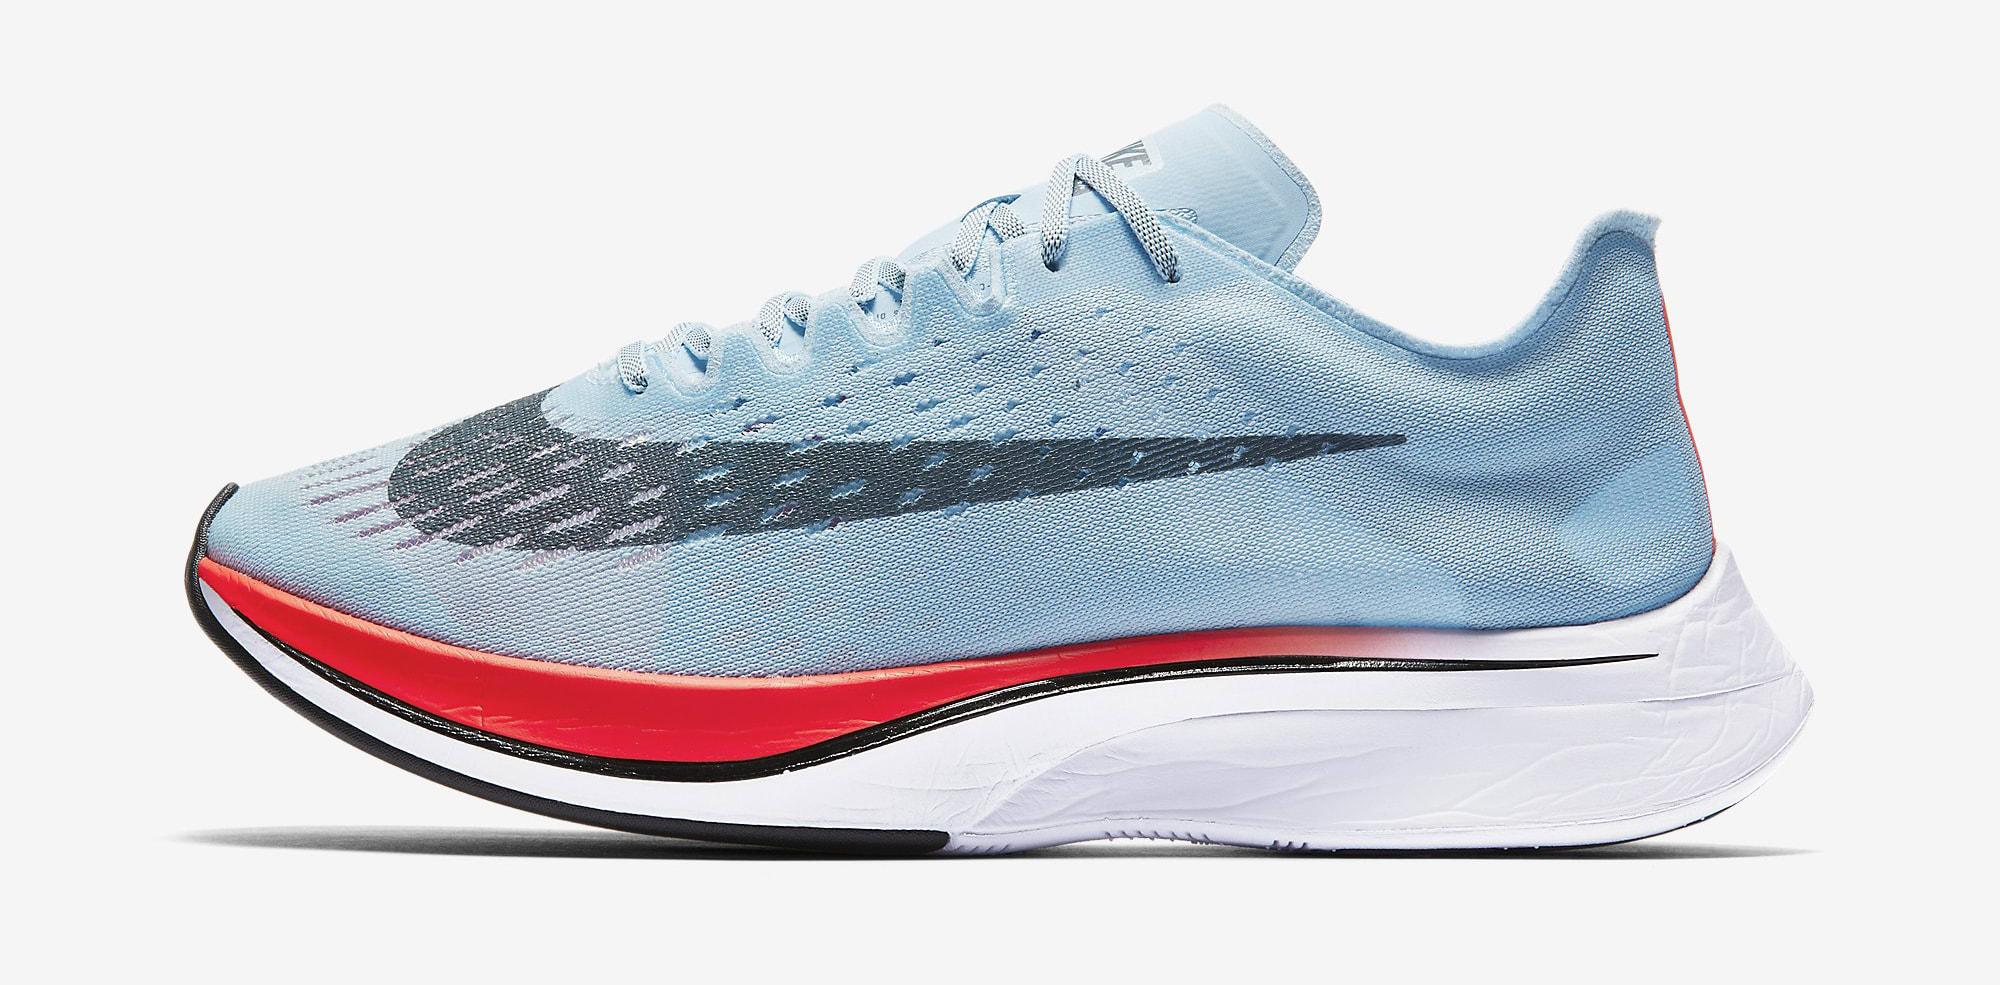 Nike Zoom Vaporfly 4 Percent 880847-401 Profile